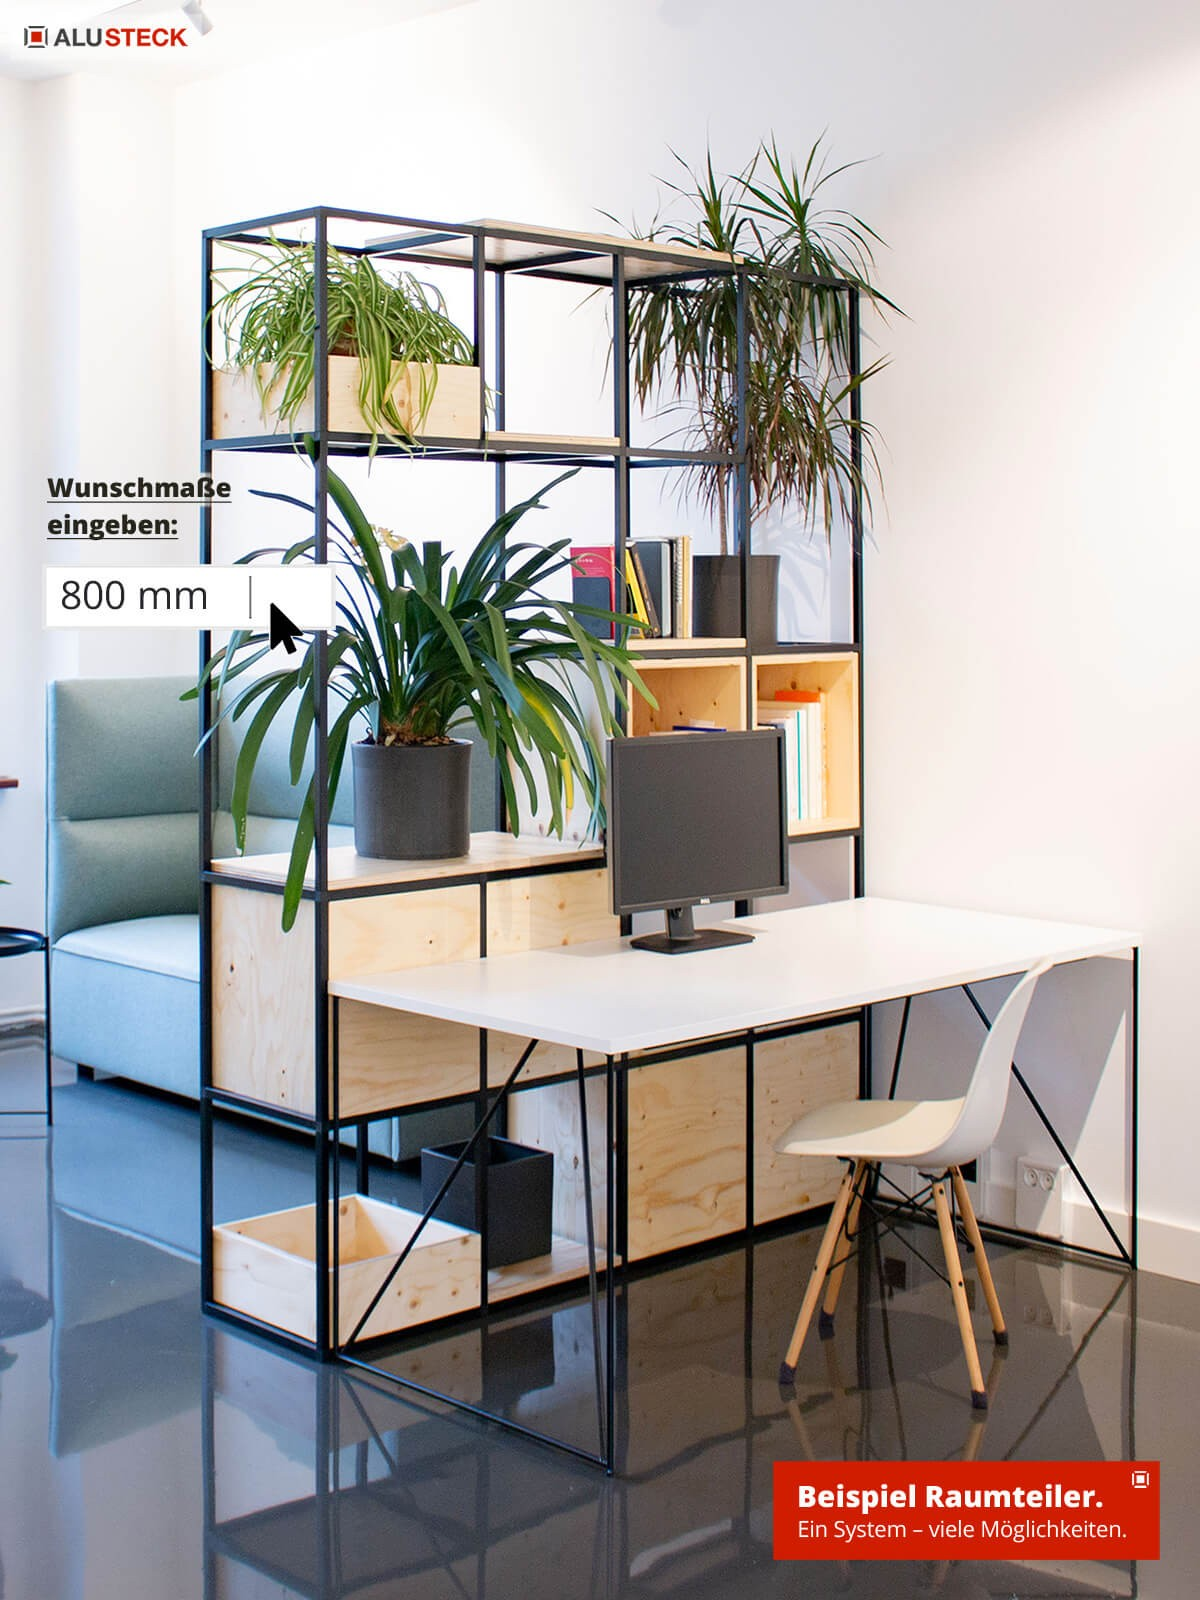 Raumteiler selber bauen - Trennwand Bauanleitung Wohnraum Paravent Ausführungen